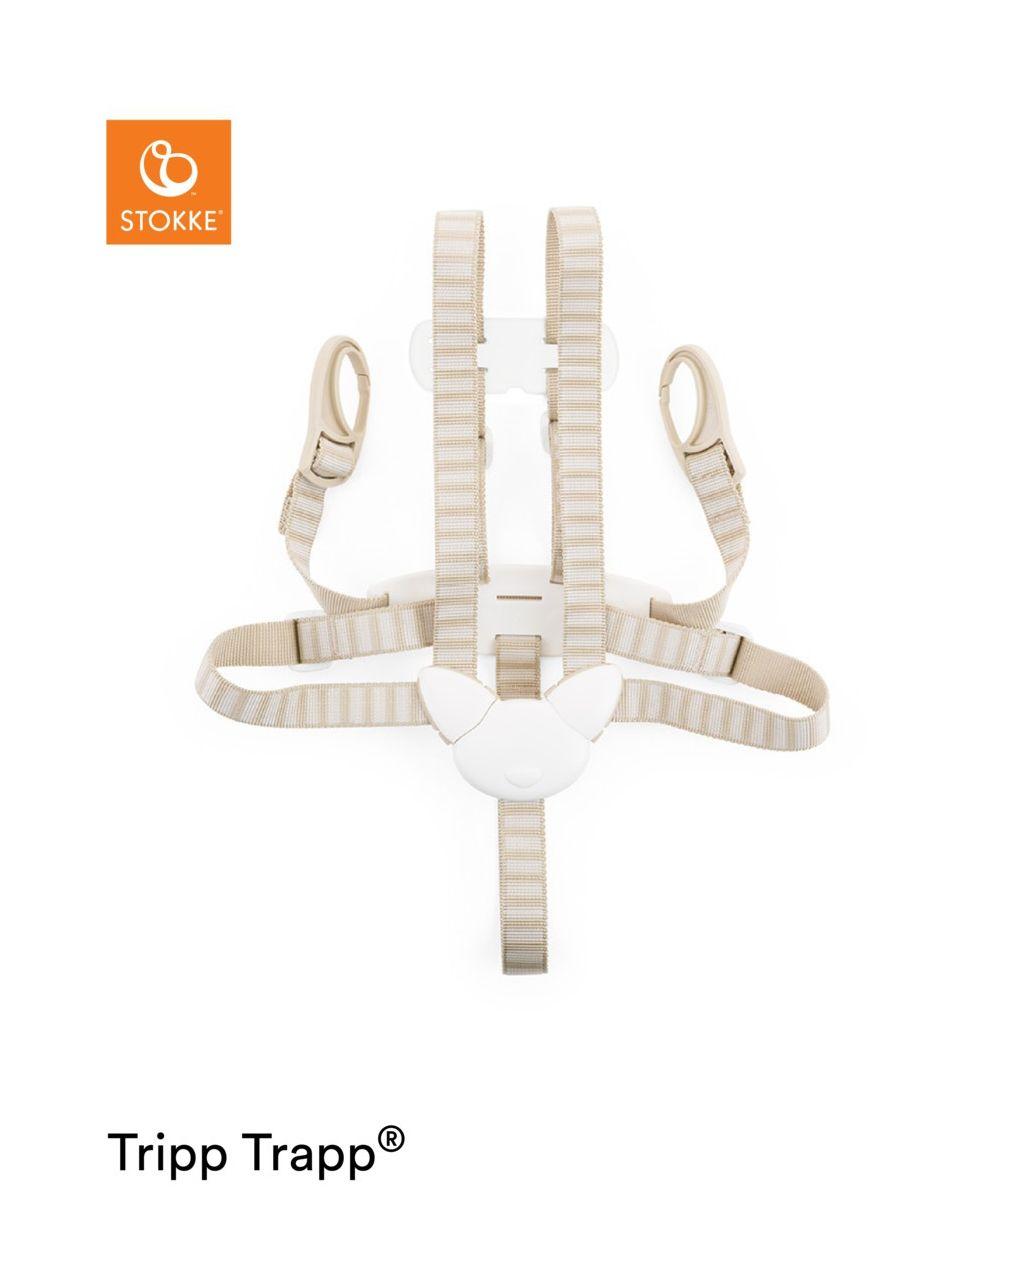 Stokke® cinture di sicurezza per tripp trapp® - Stokke